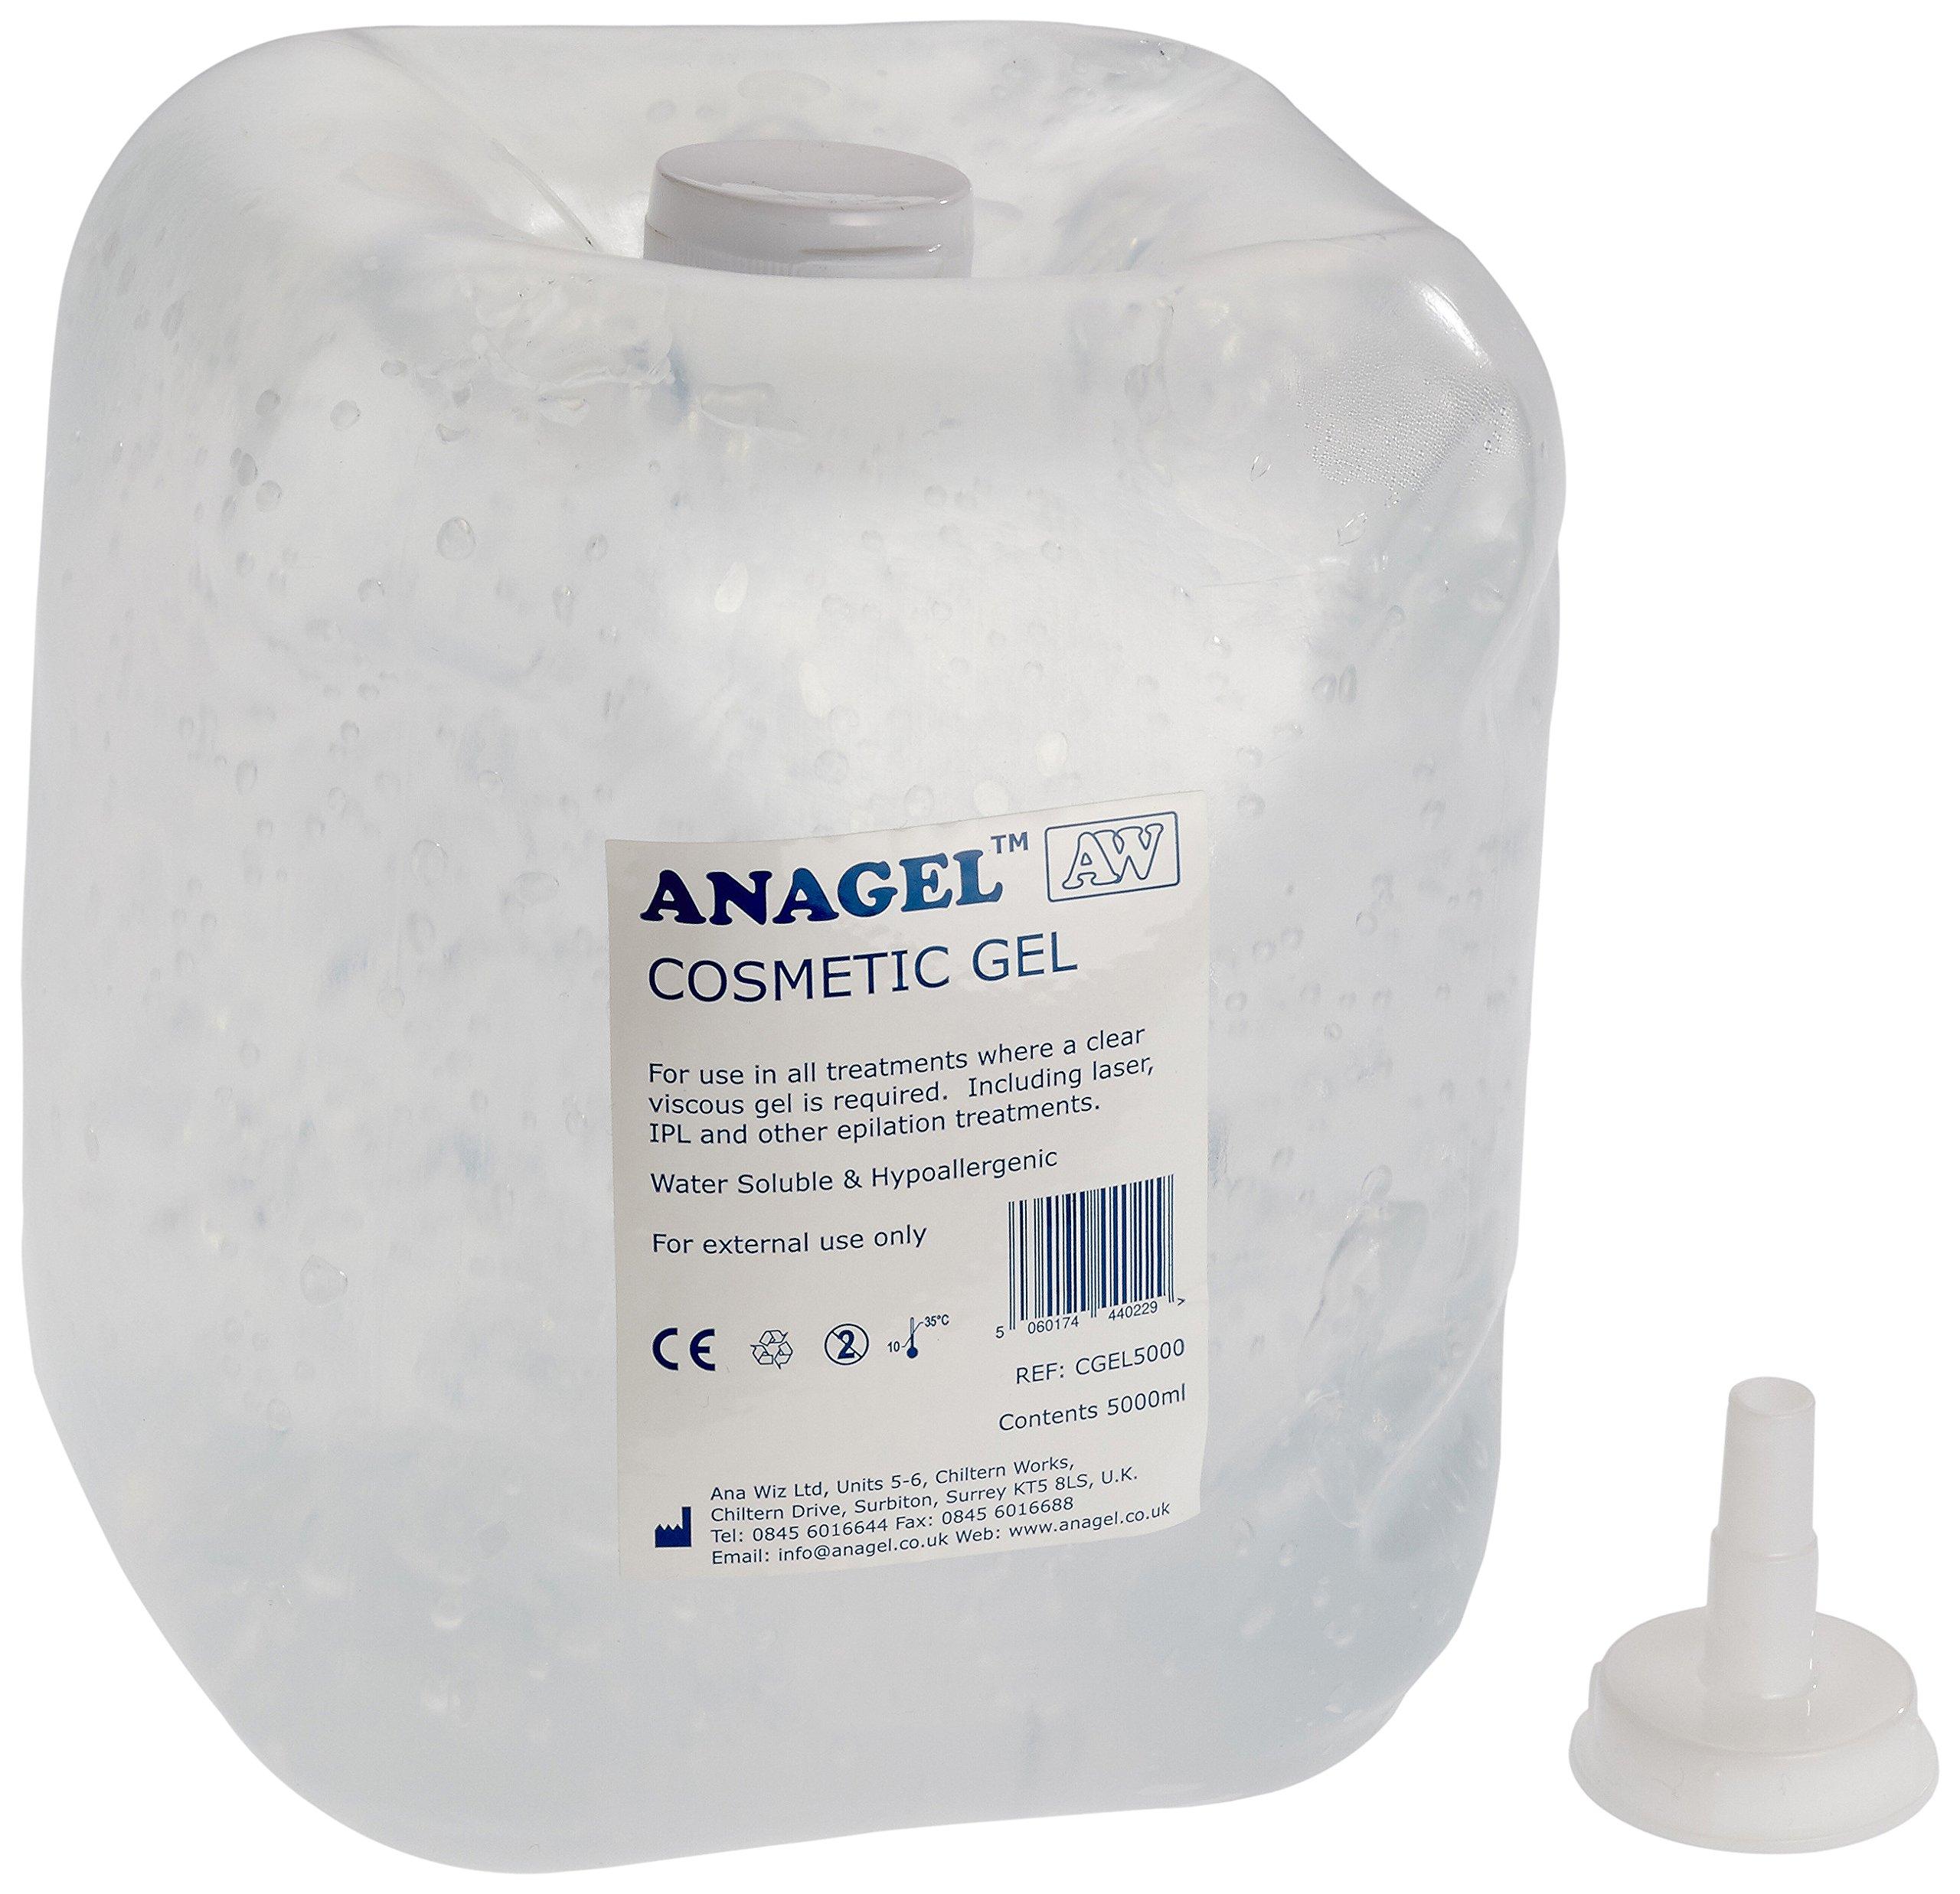 Anagel 5L Cosmetic IPL/ Laser Gel